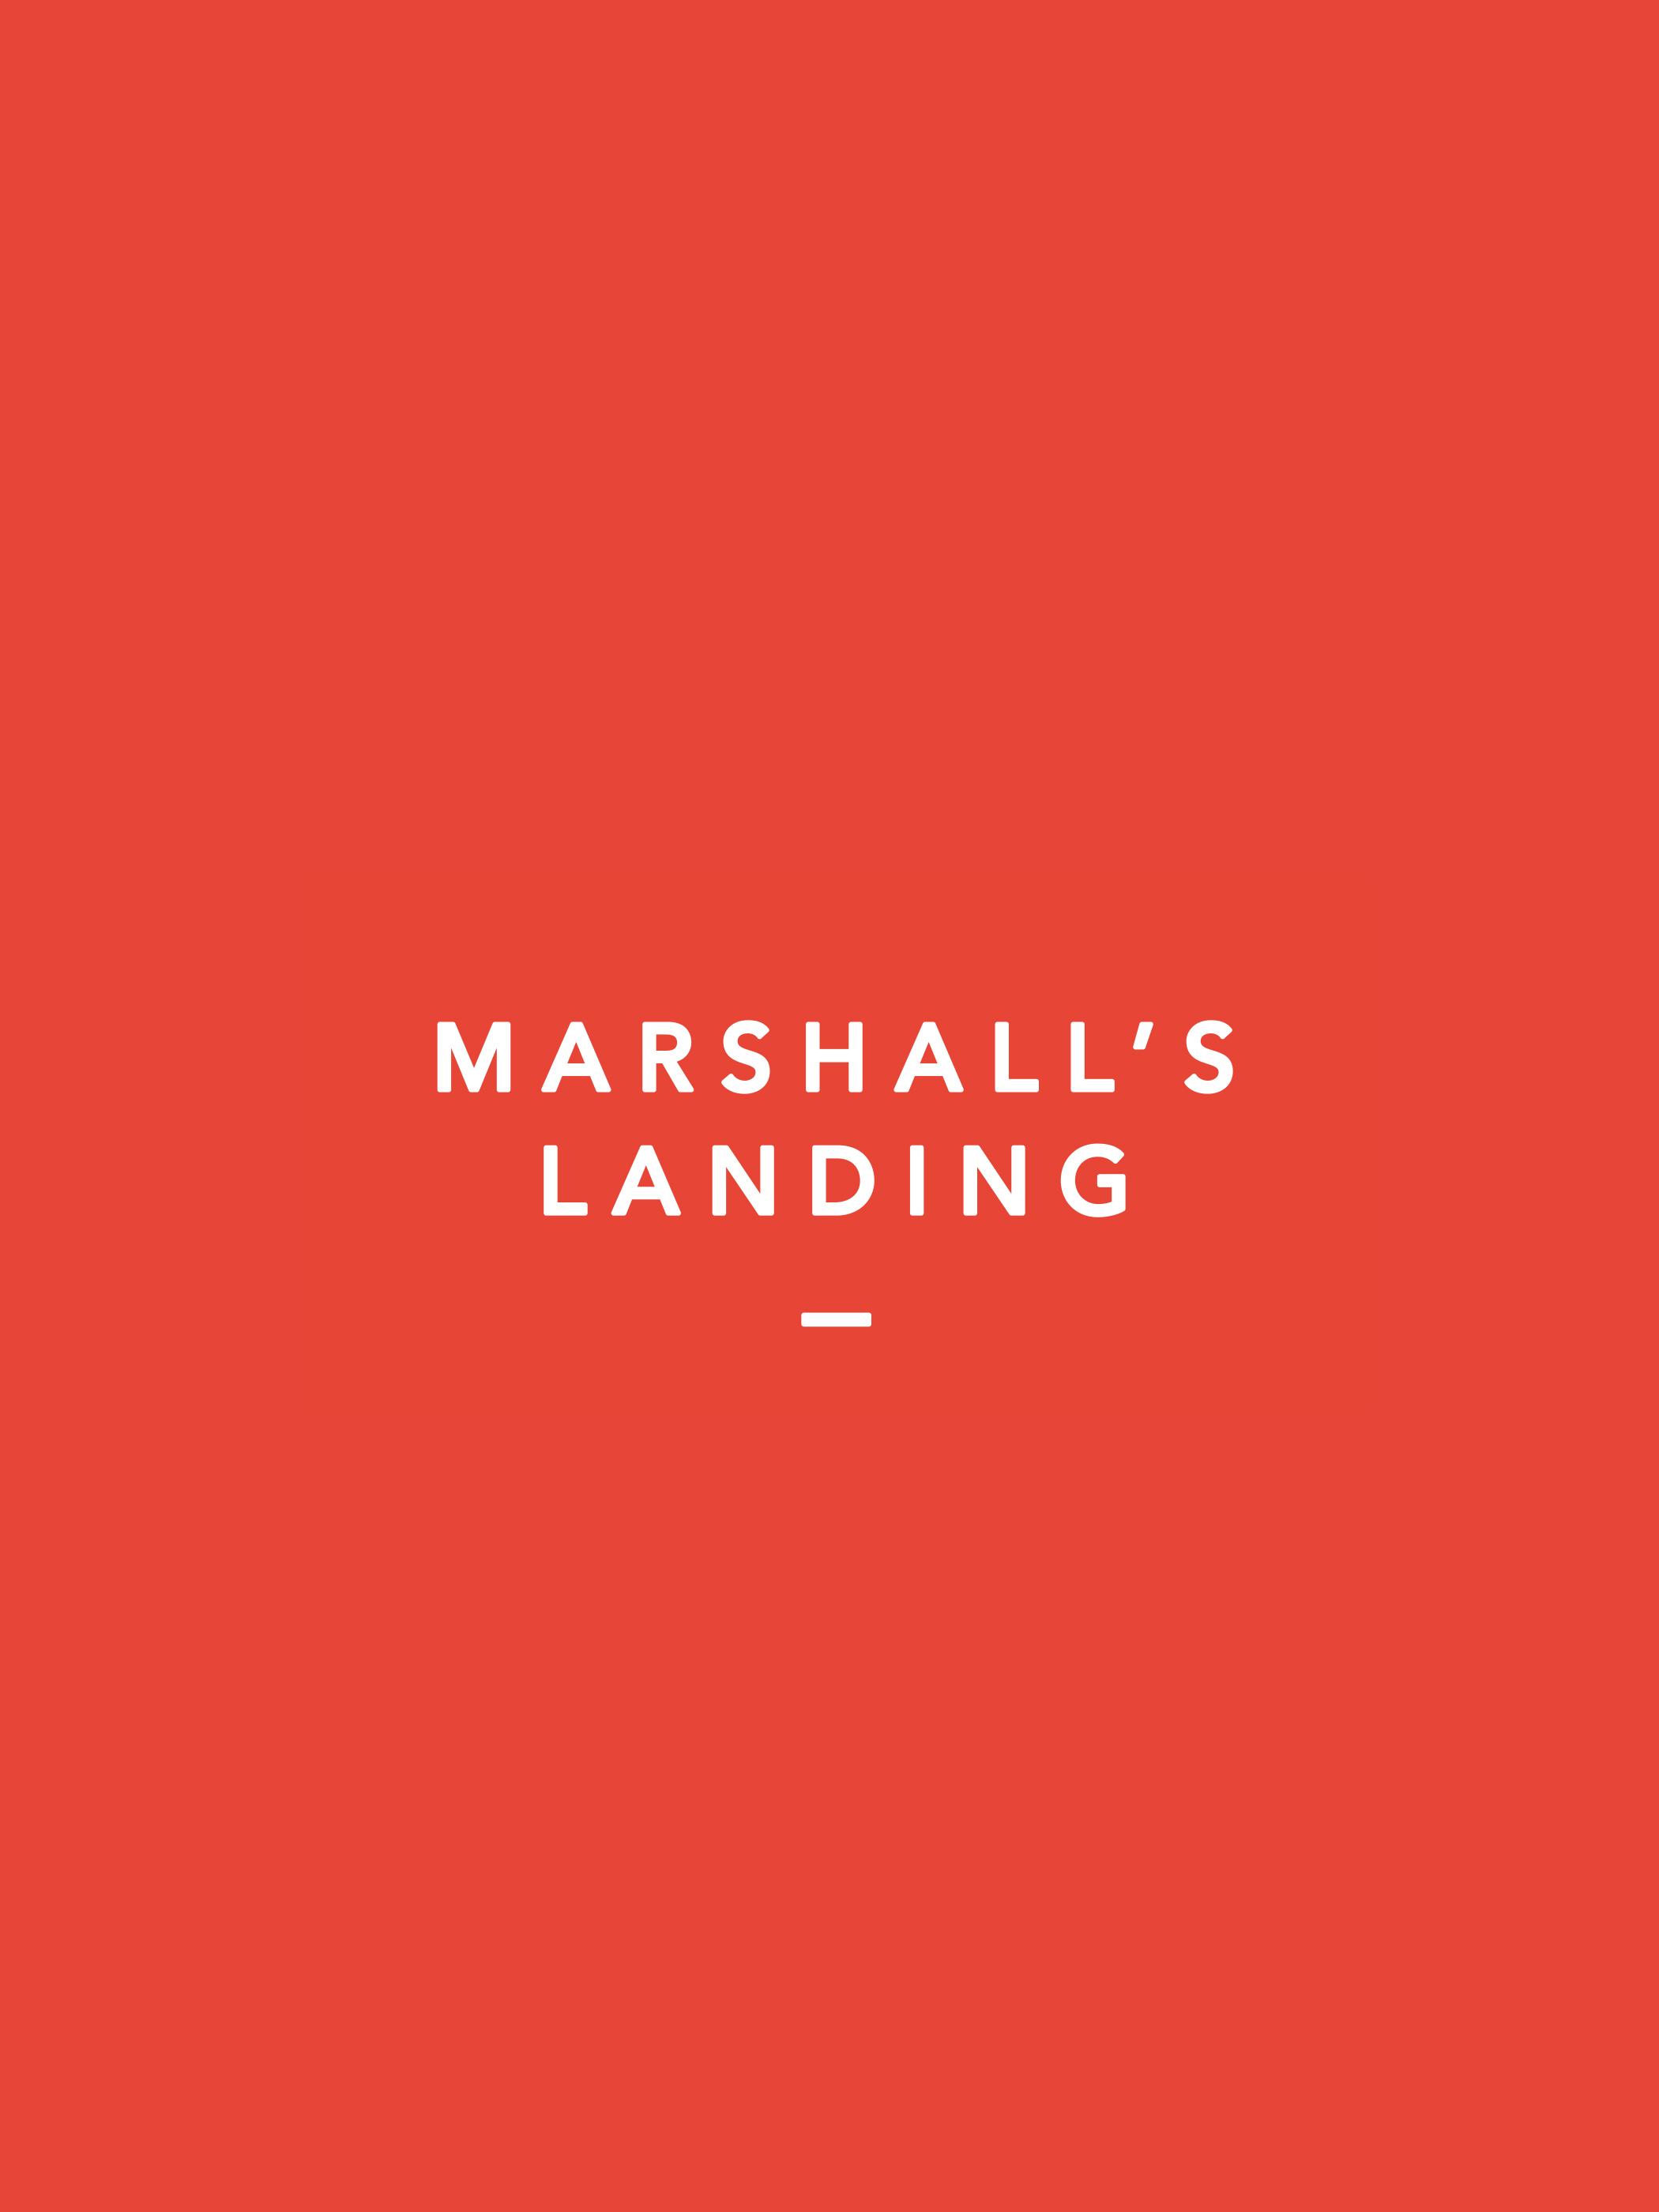 Marshalls Landing_Branding_Page_00.jpg